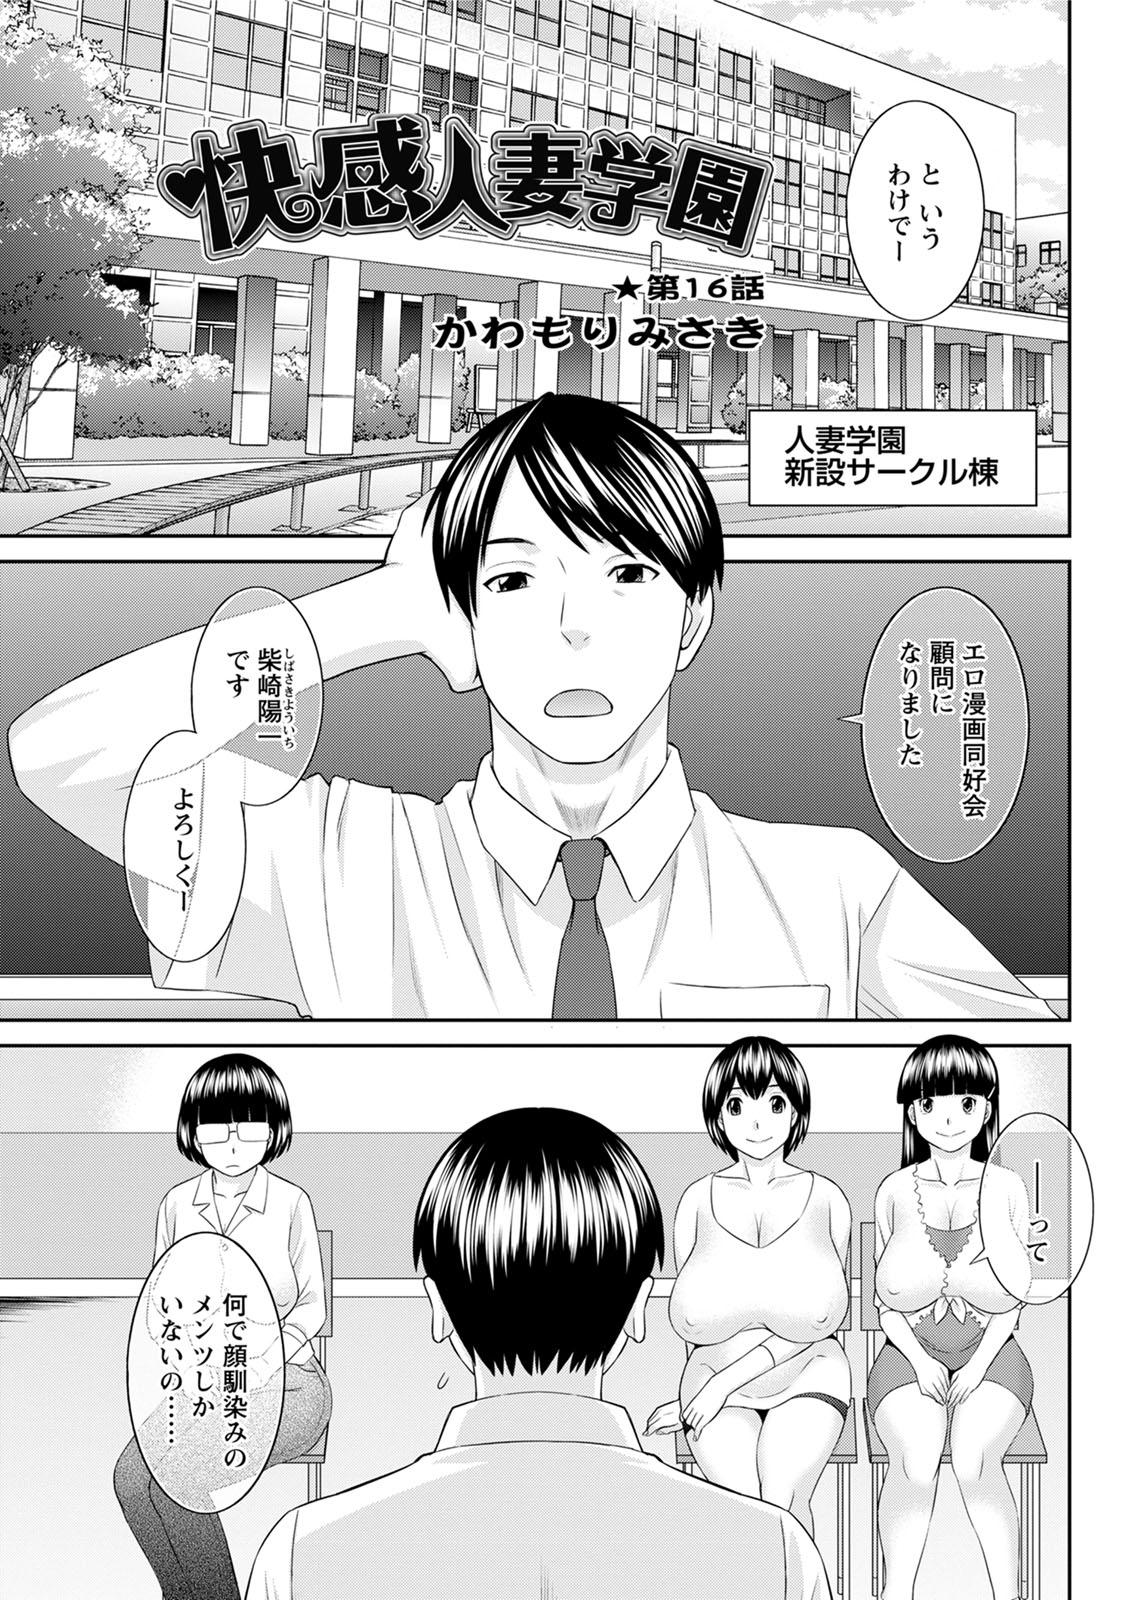 [Kawamori Misaki] Kaikan Hitotsuma Gakuen Ch. 1-6, 8-20 [Digital] 257